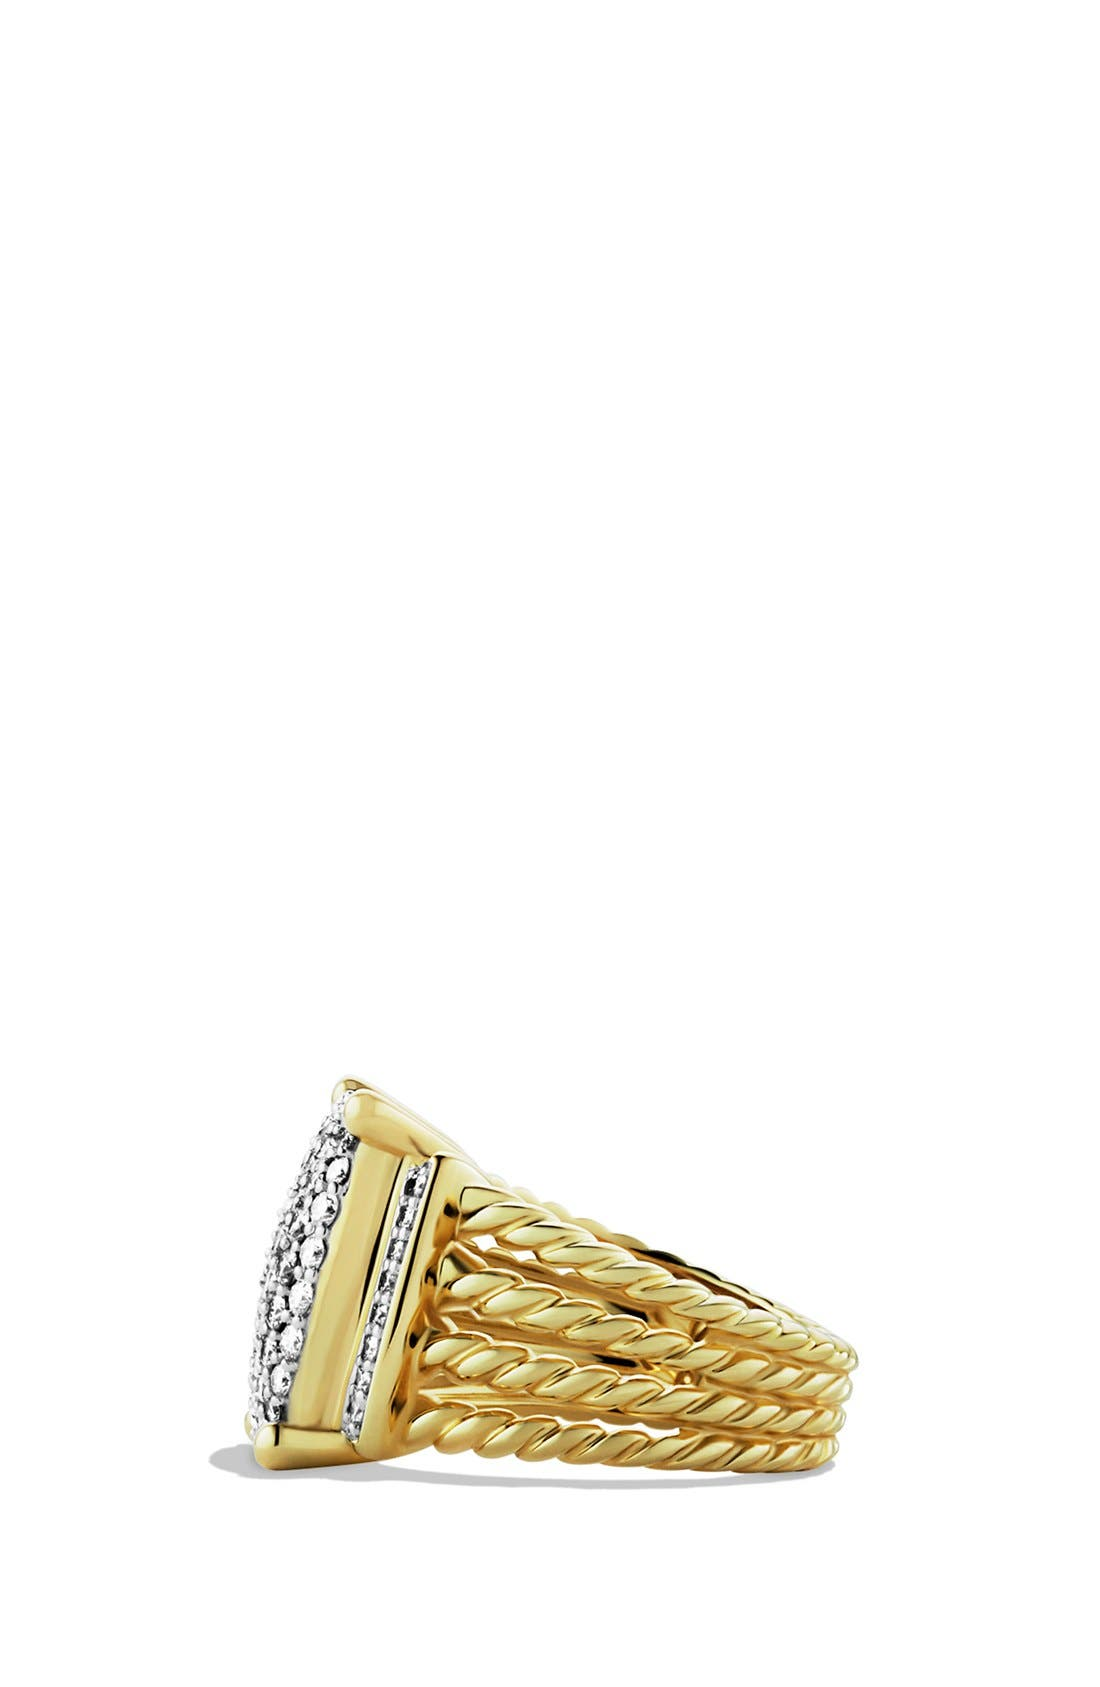 'Wheaton' Ring with Diamonds in Gold,                             Alternate thumbnail 3, color,                             DIAMOND